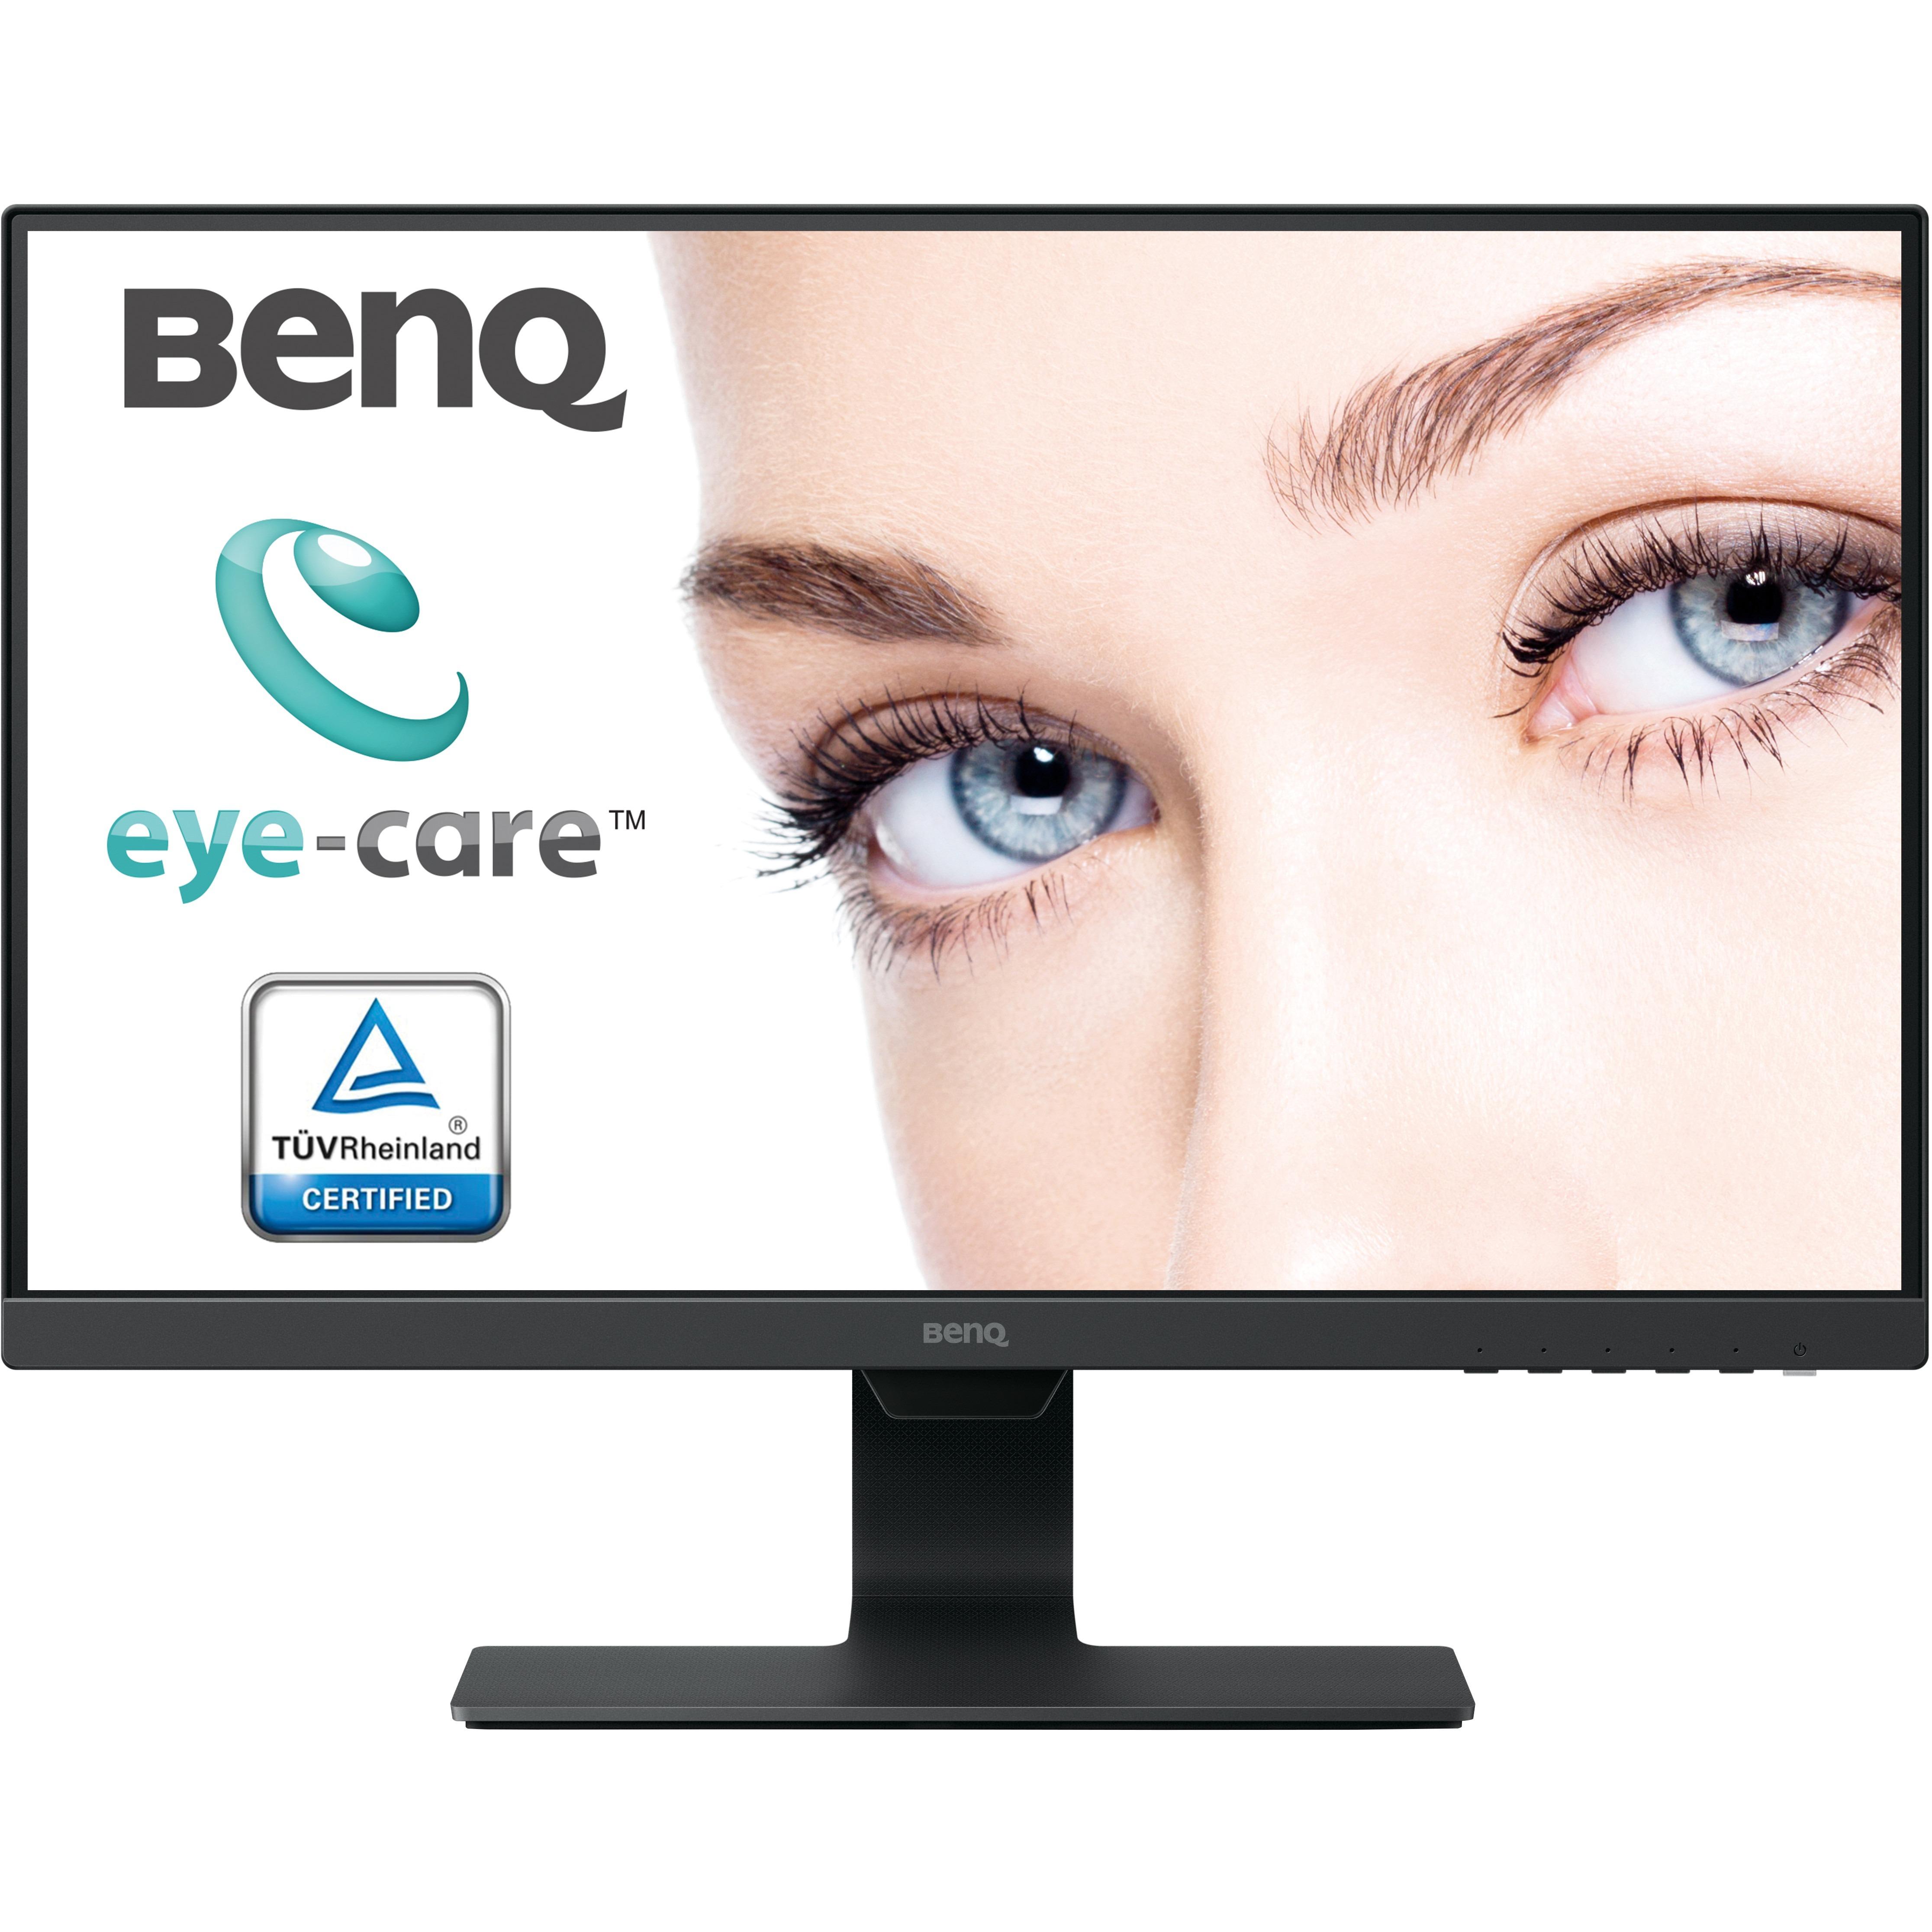 BenQ BL2480 23.8And#34; Full HD LED LCD Monitor